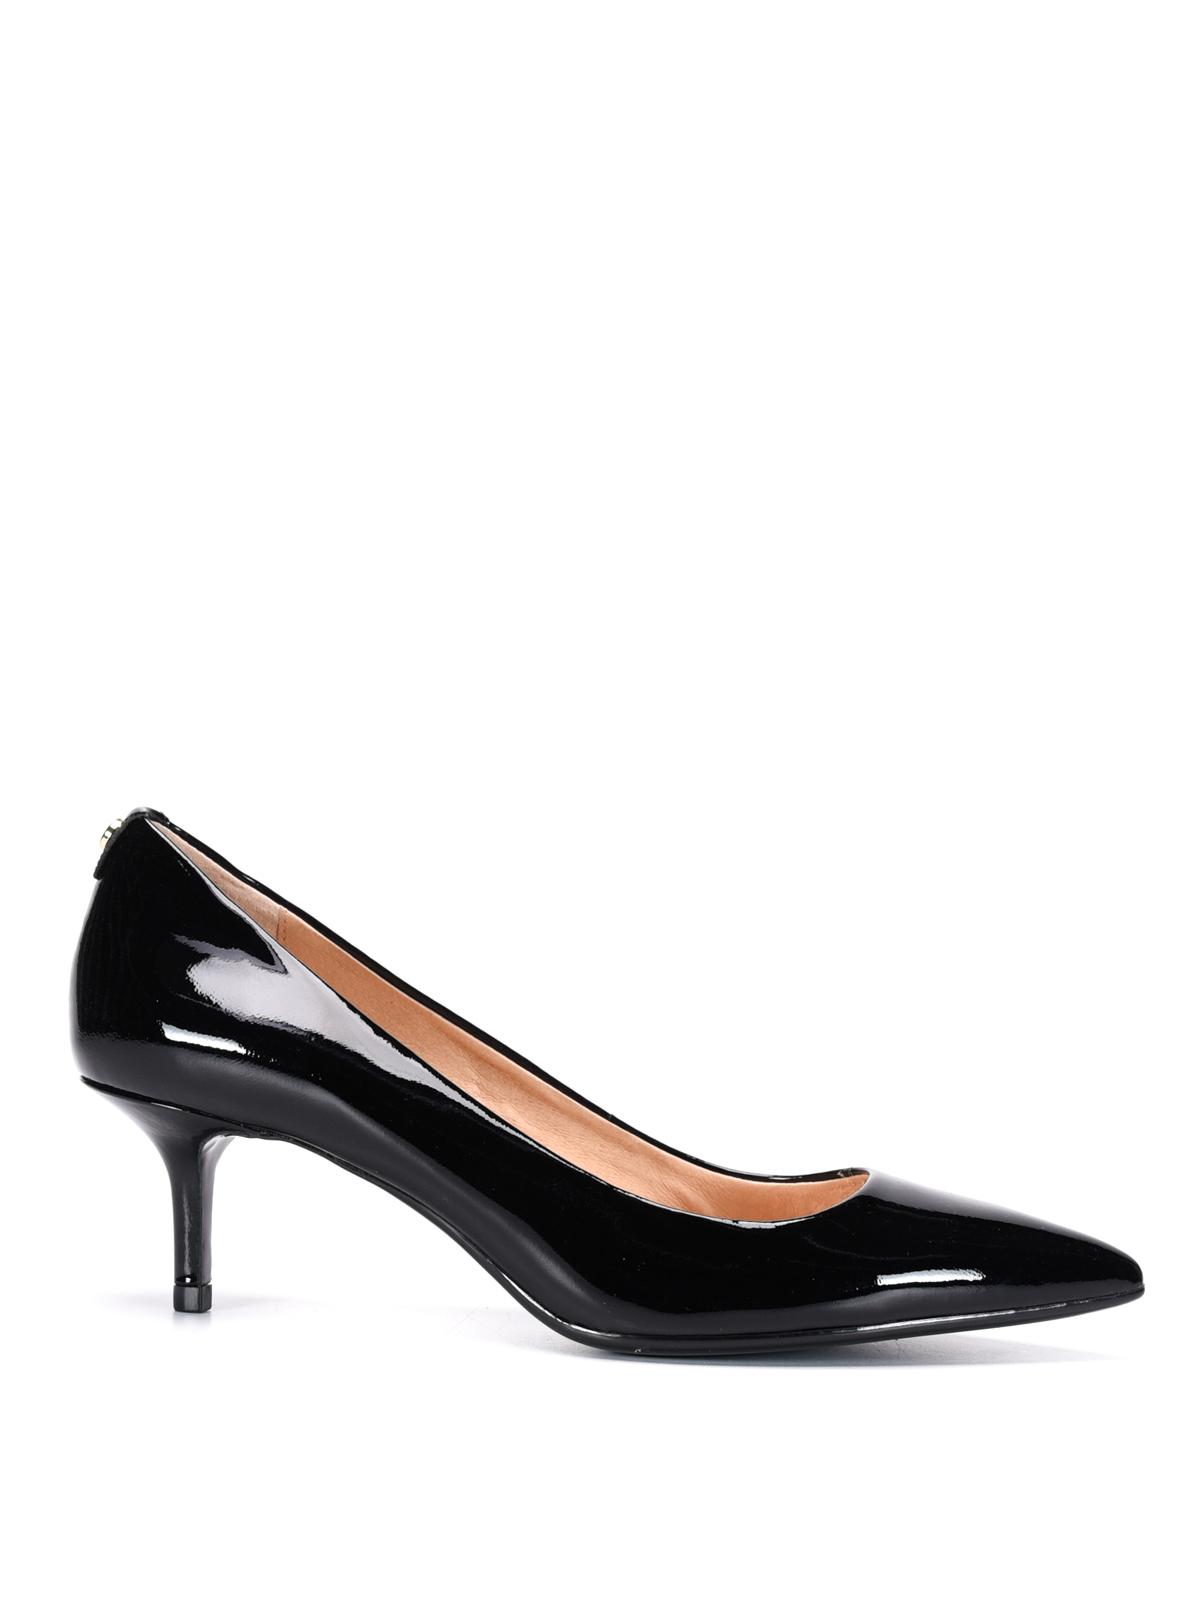 flex kitten pumps by michael kors court shoes ikrix. Black Bedroom Furniture Sets. Home Design Ideas